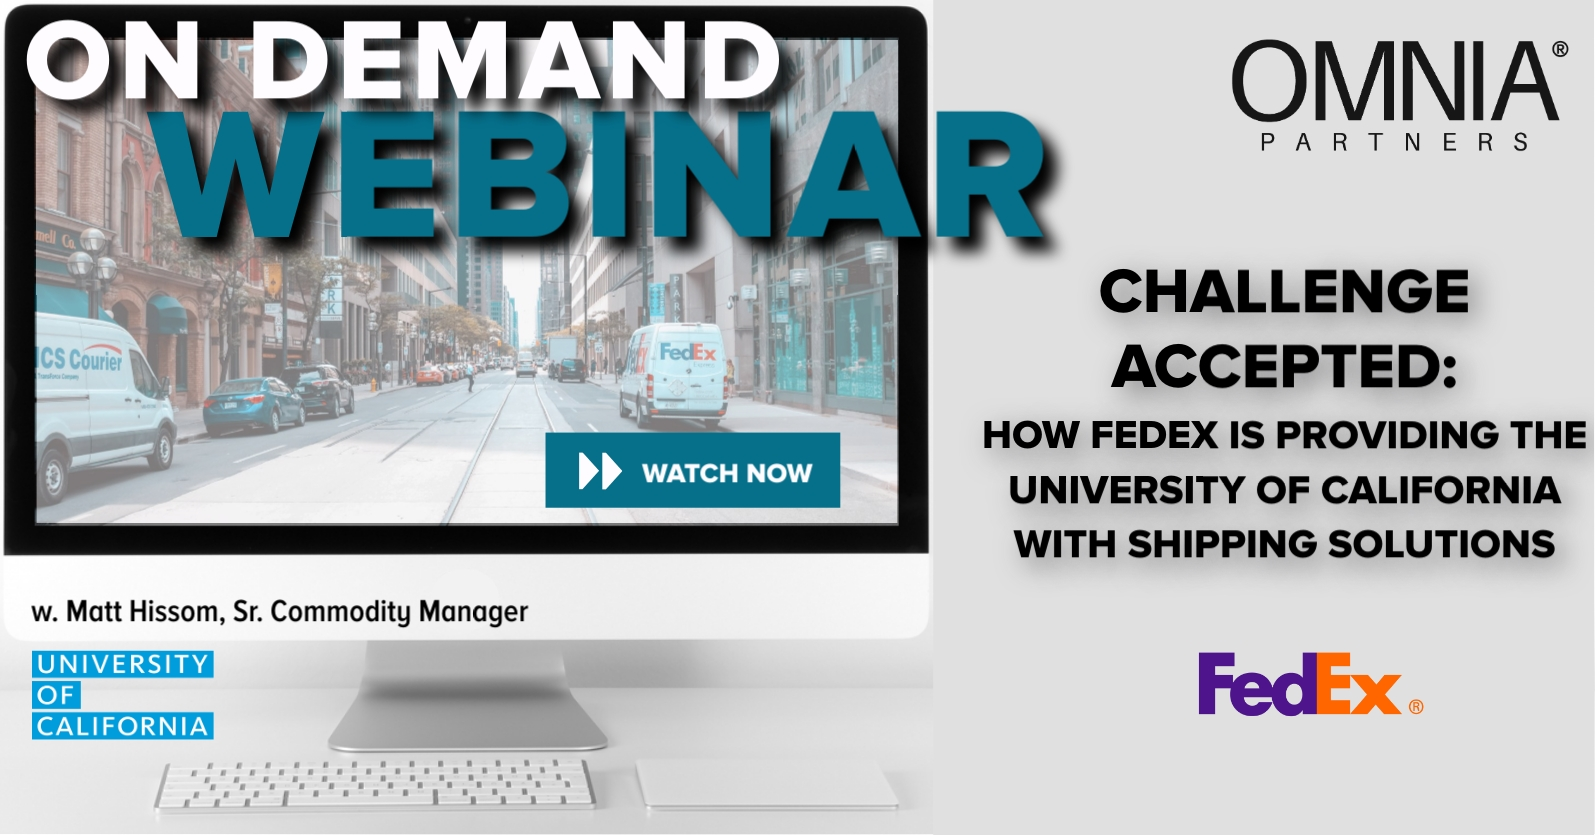 FedEx - Post Webinar social